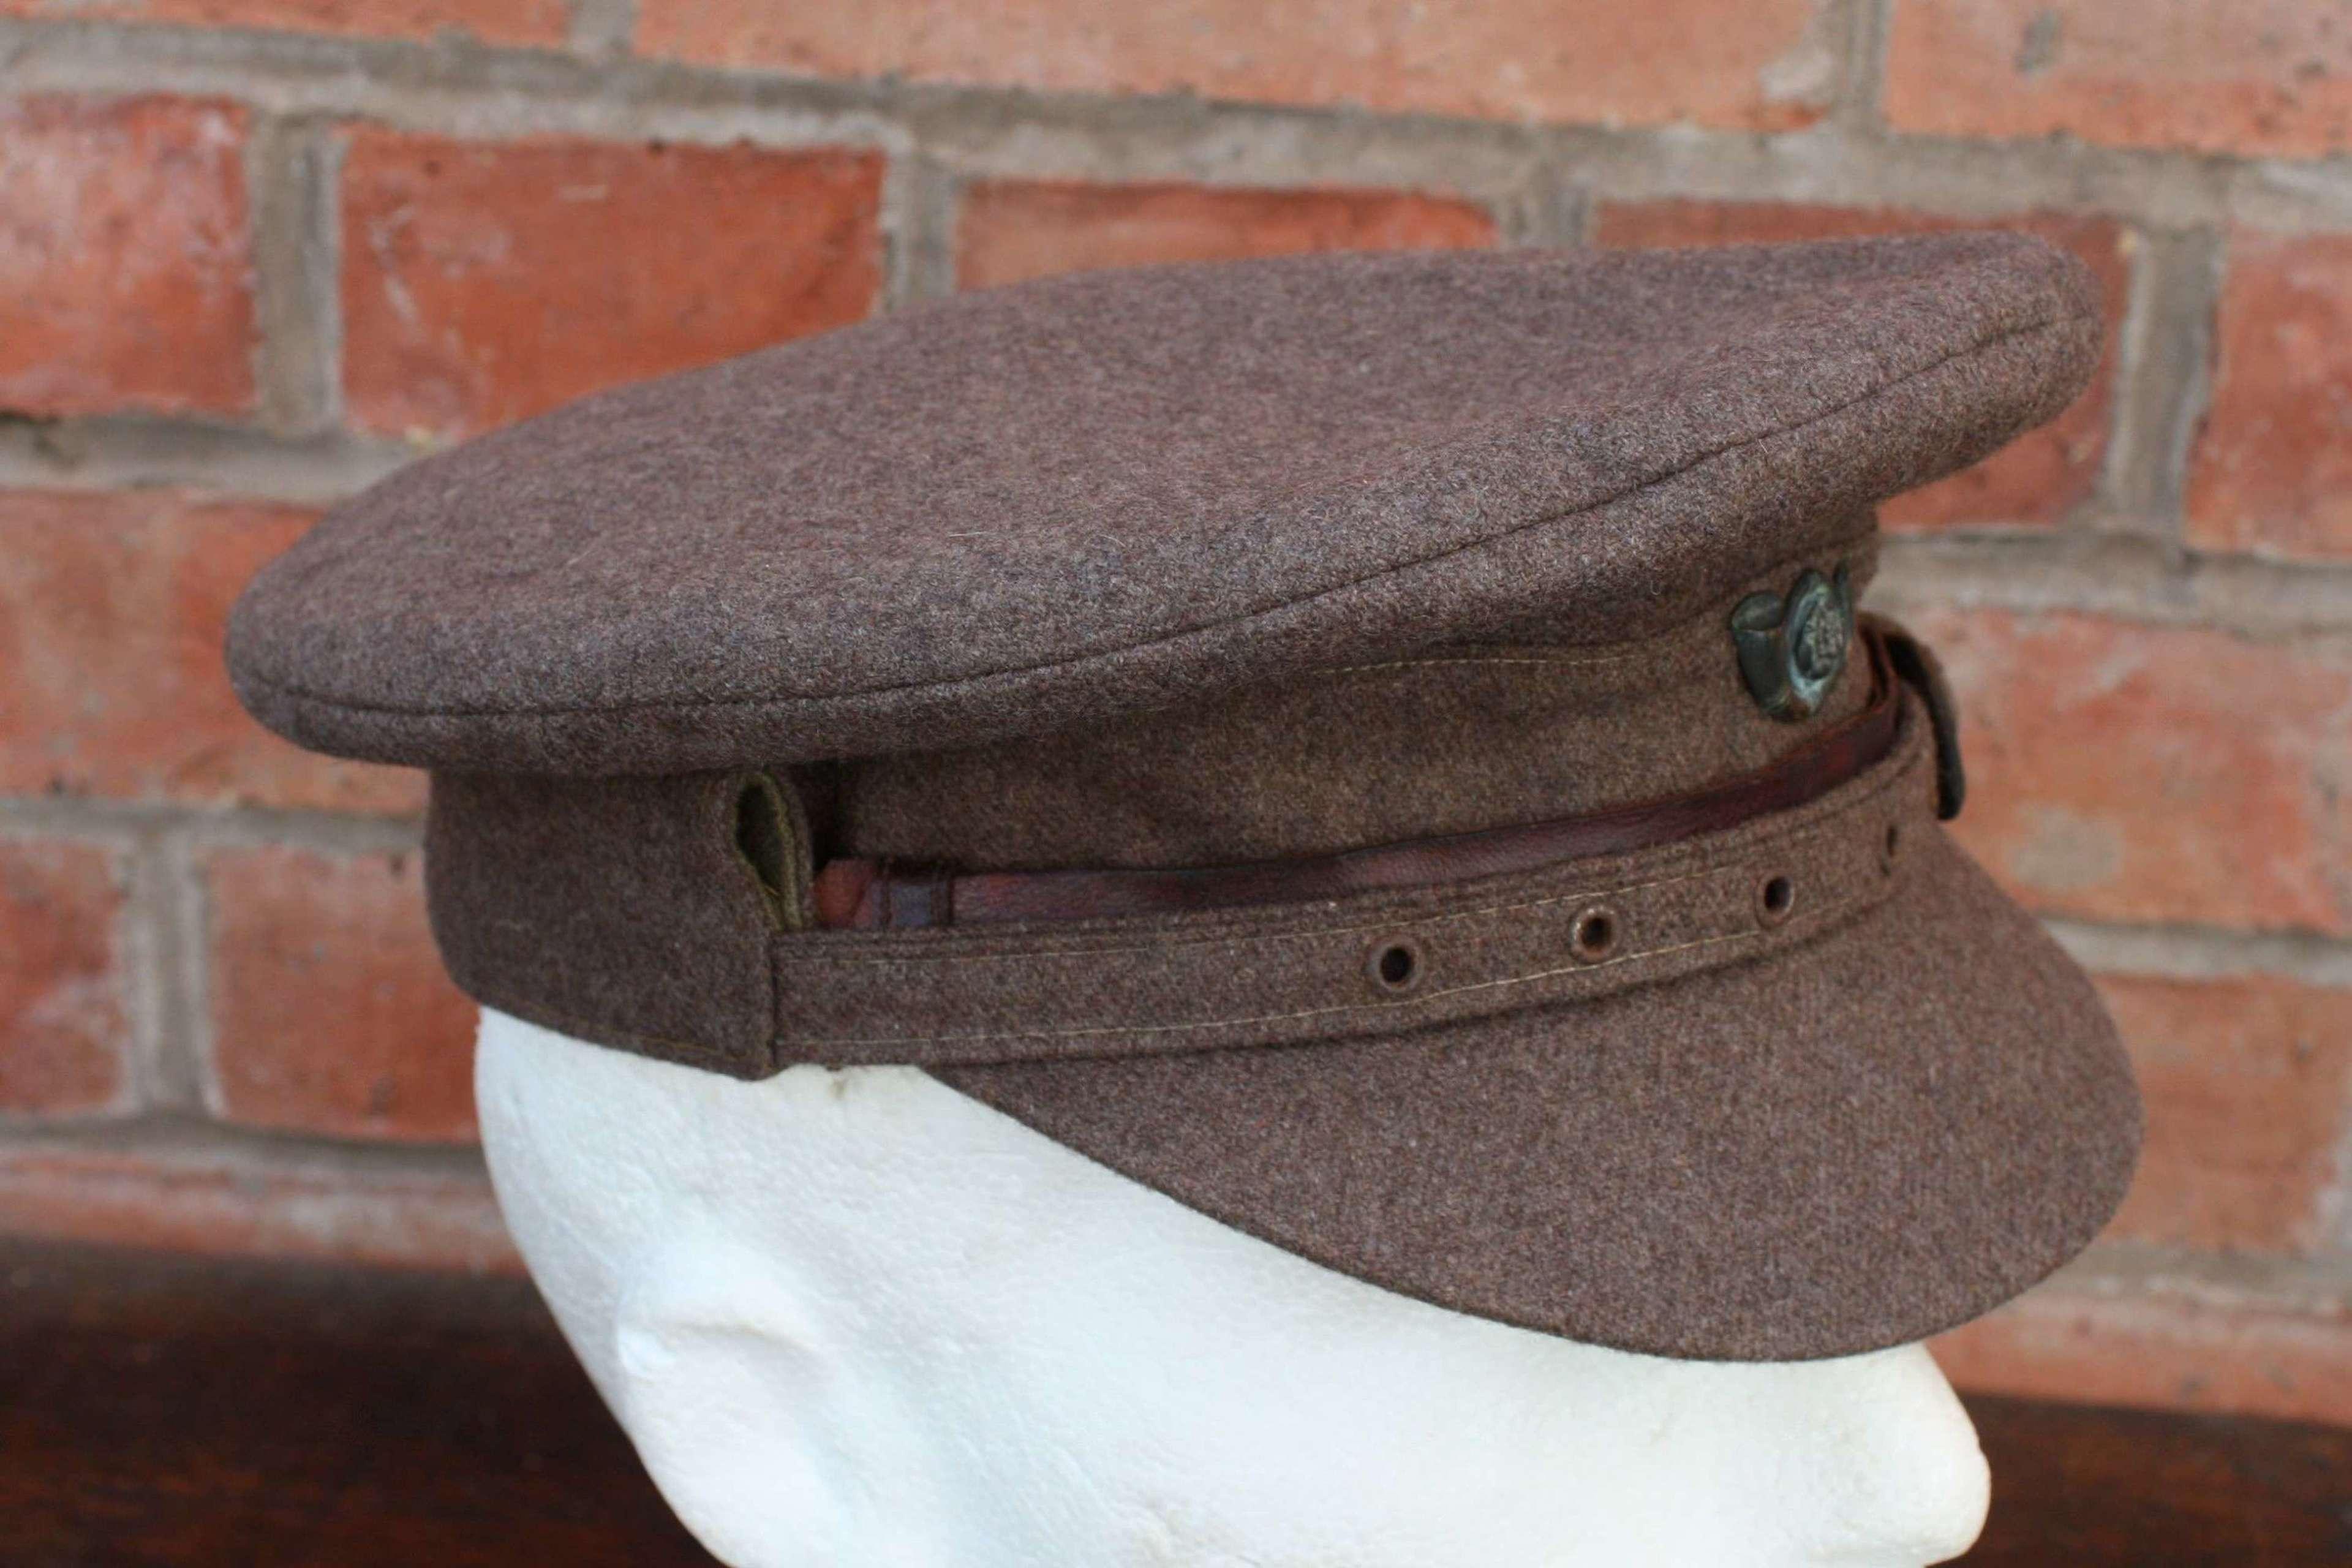 WW1 BRITISH ARMY OFFICER'S 'COR BLIMEY' CAP KOYLI KINGS OWN YORKSH